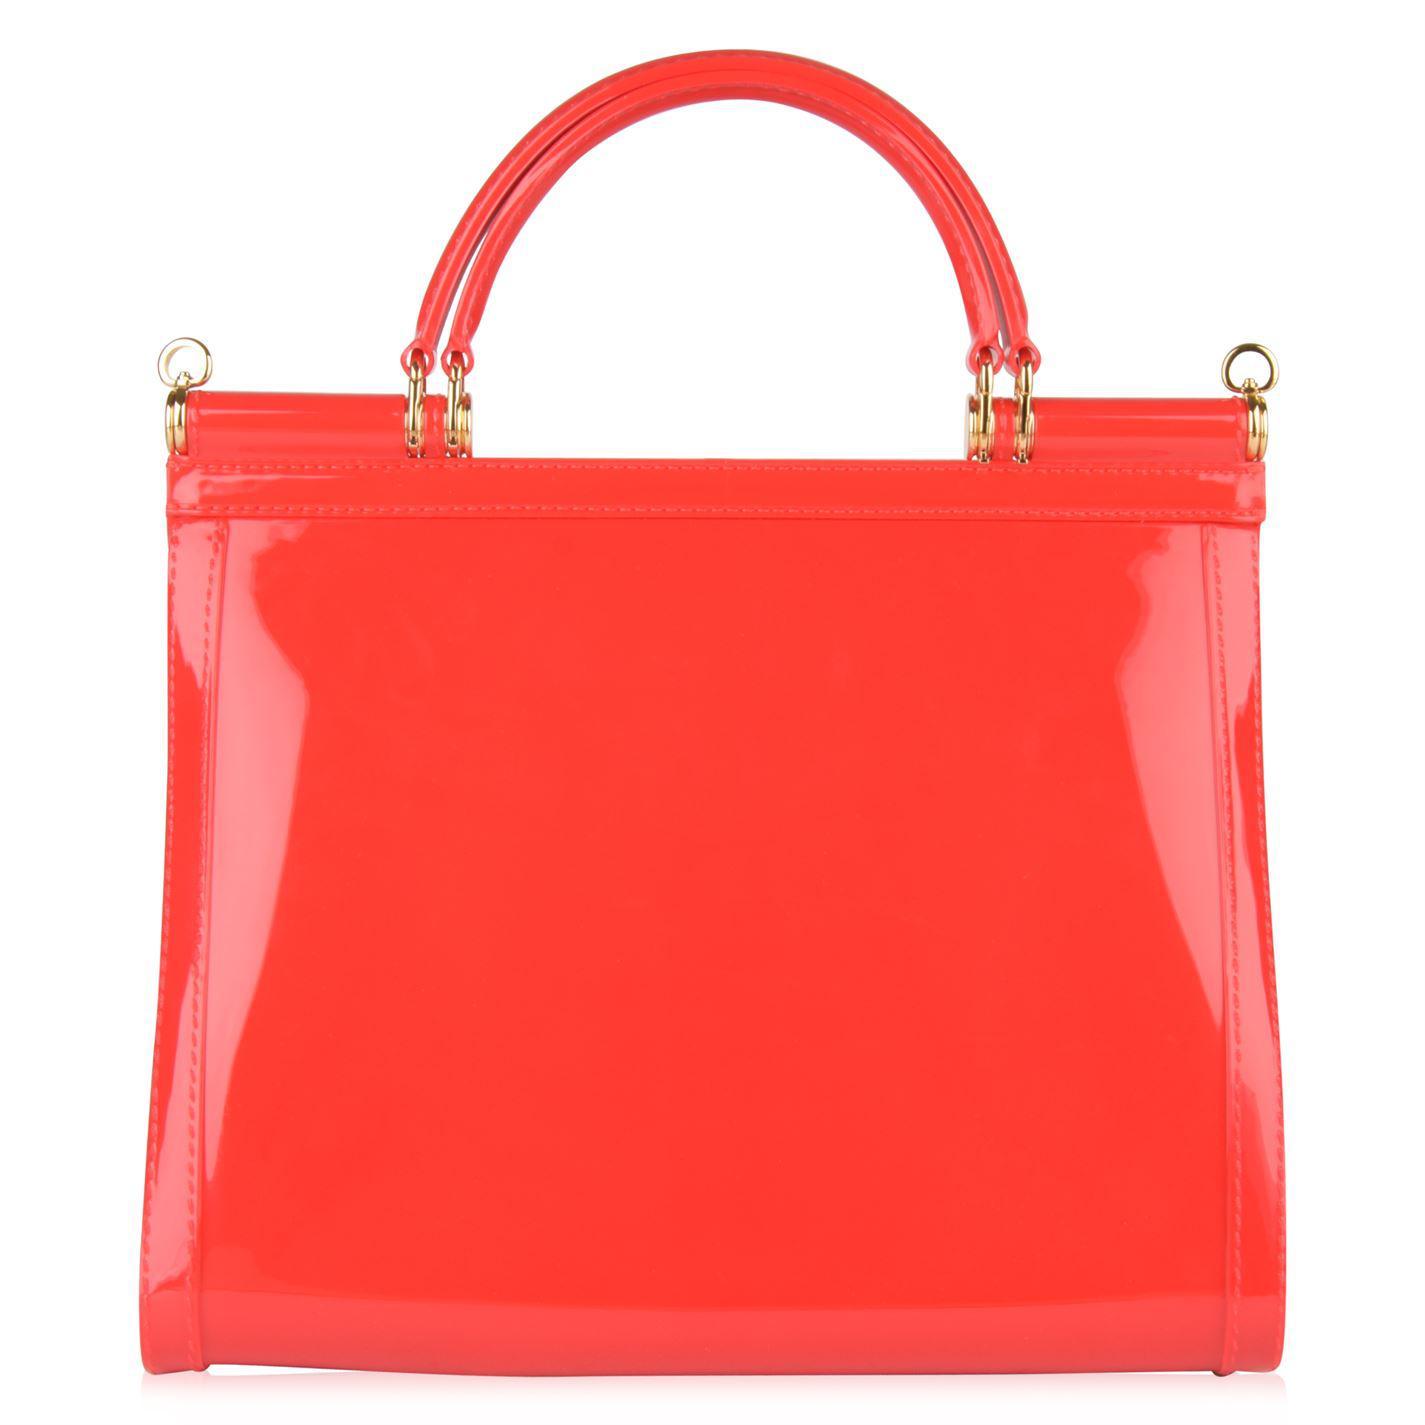 ebe535824173 Lyst - Dolce   Gabbana Sicily Semi Transparent Rubber Bag in Red